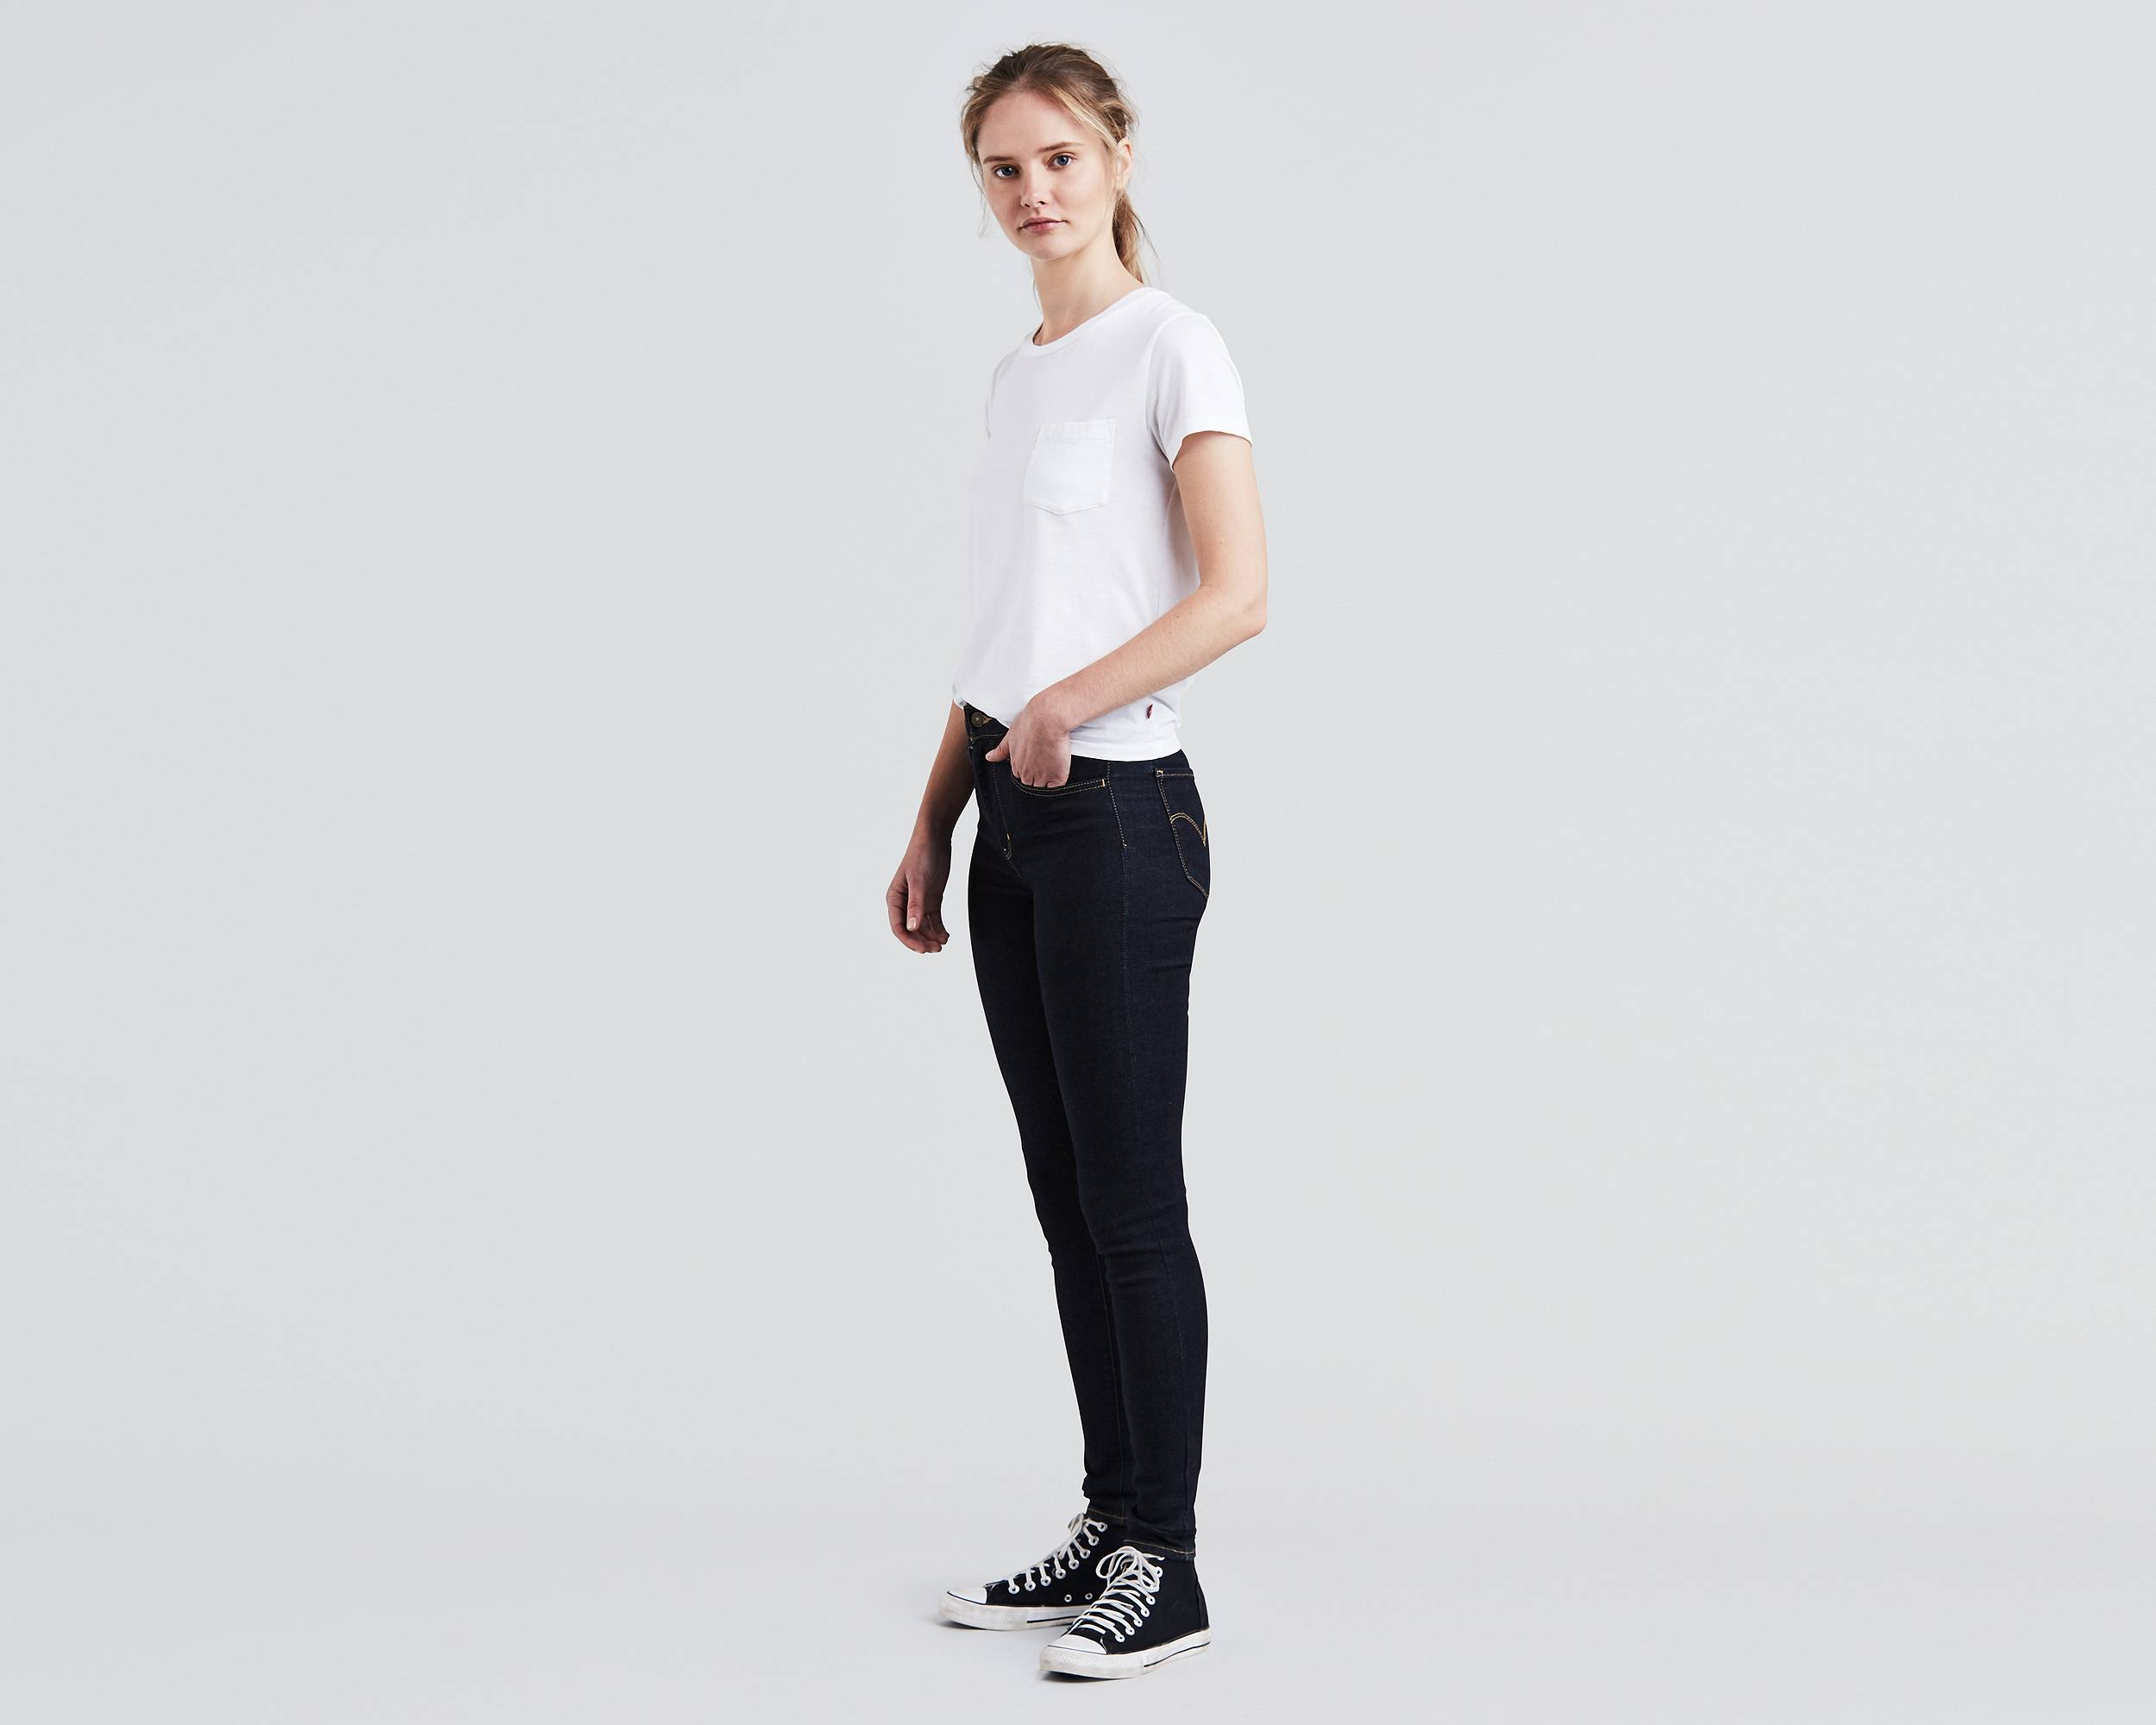 6031c9f1 Levi's 720 Hypersculpt High Rise Super Skinny Jeans at £85   love ...